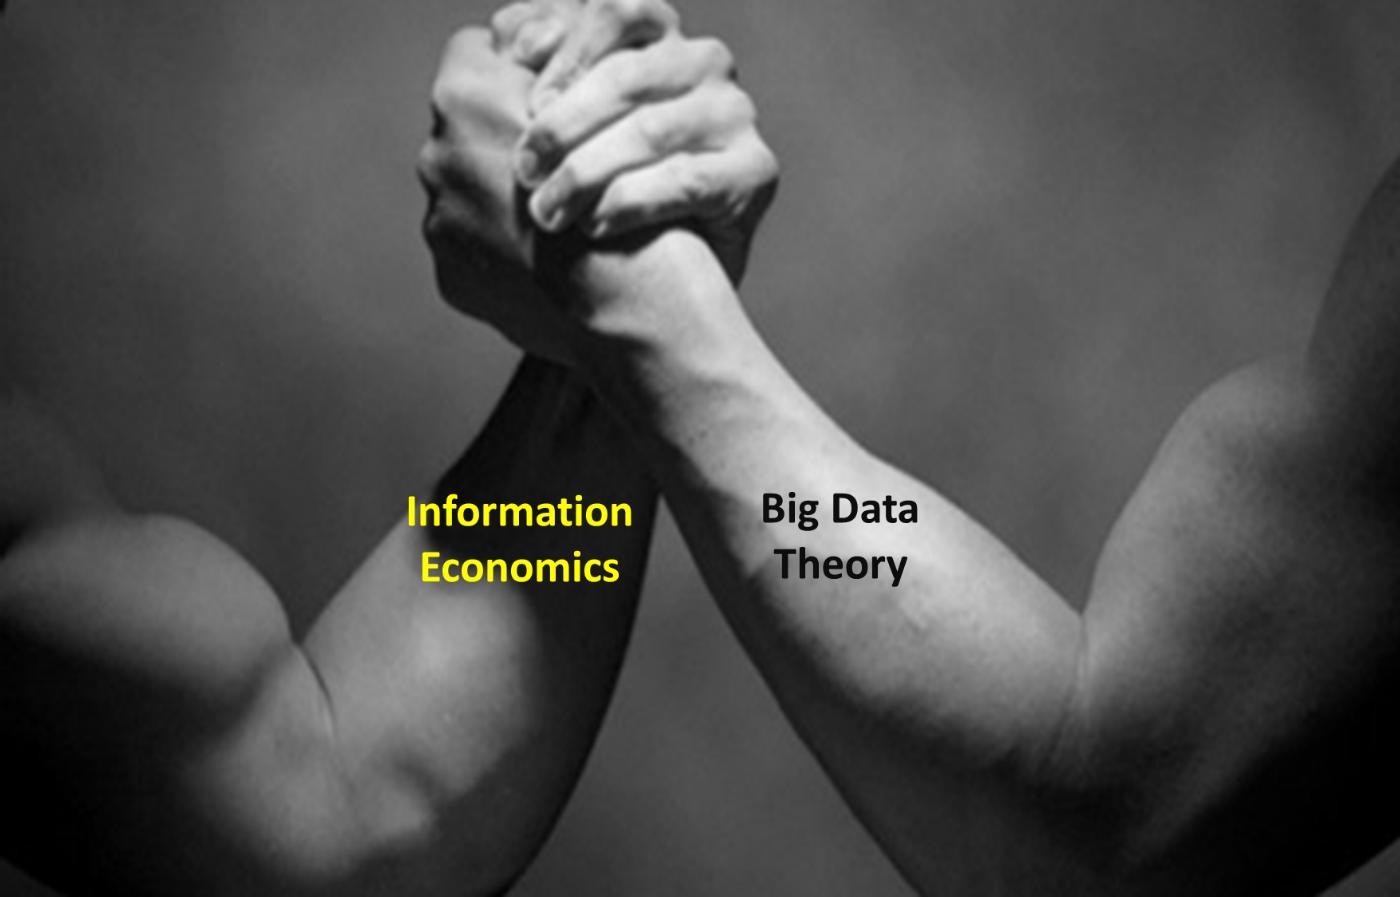 https://www.lone-star.com/wp-content/uploads/2018/08/Information-Economics-vs-Big-Data.png